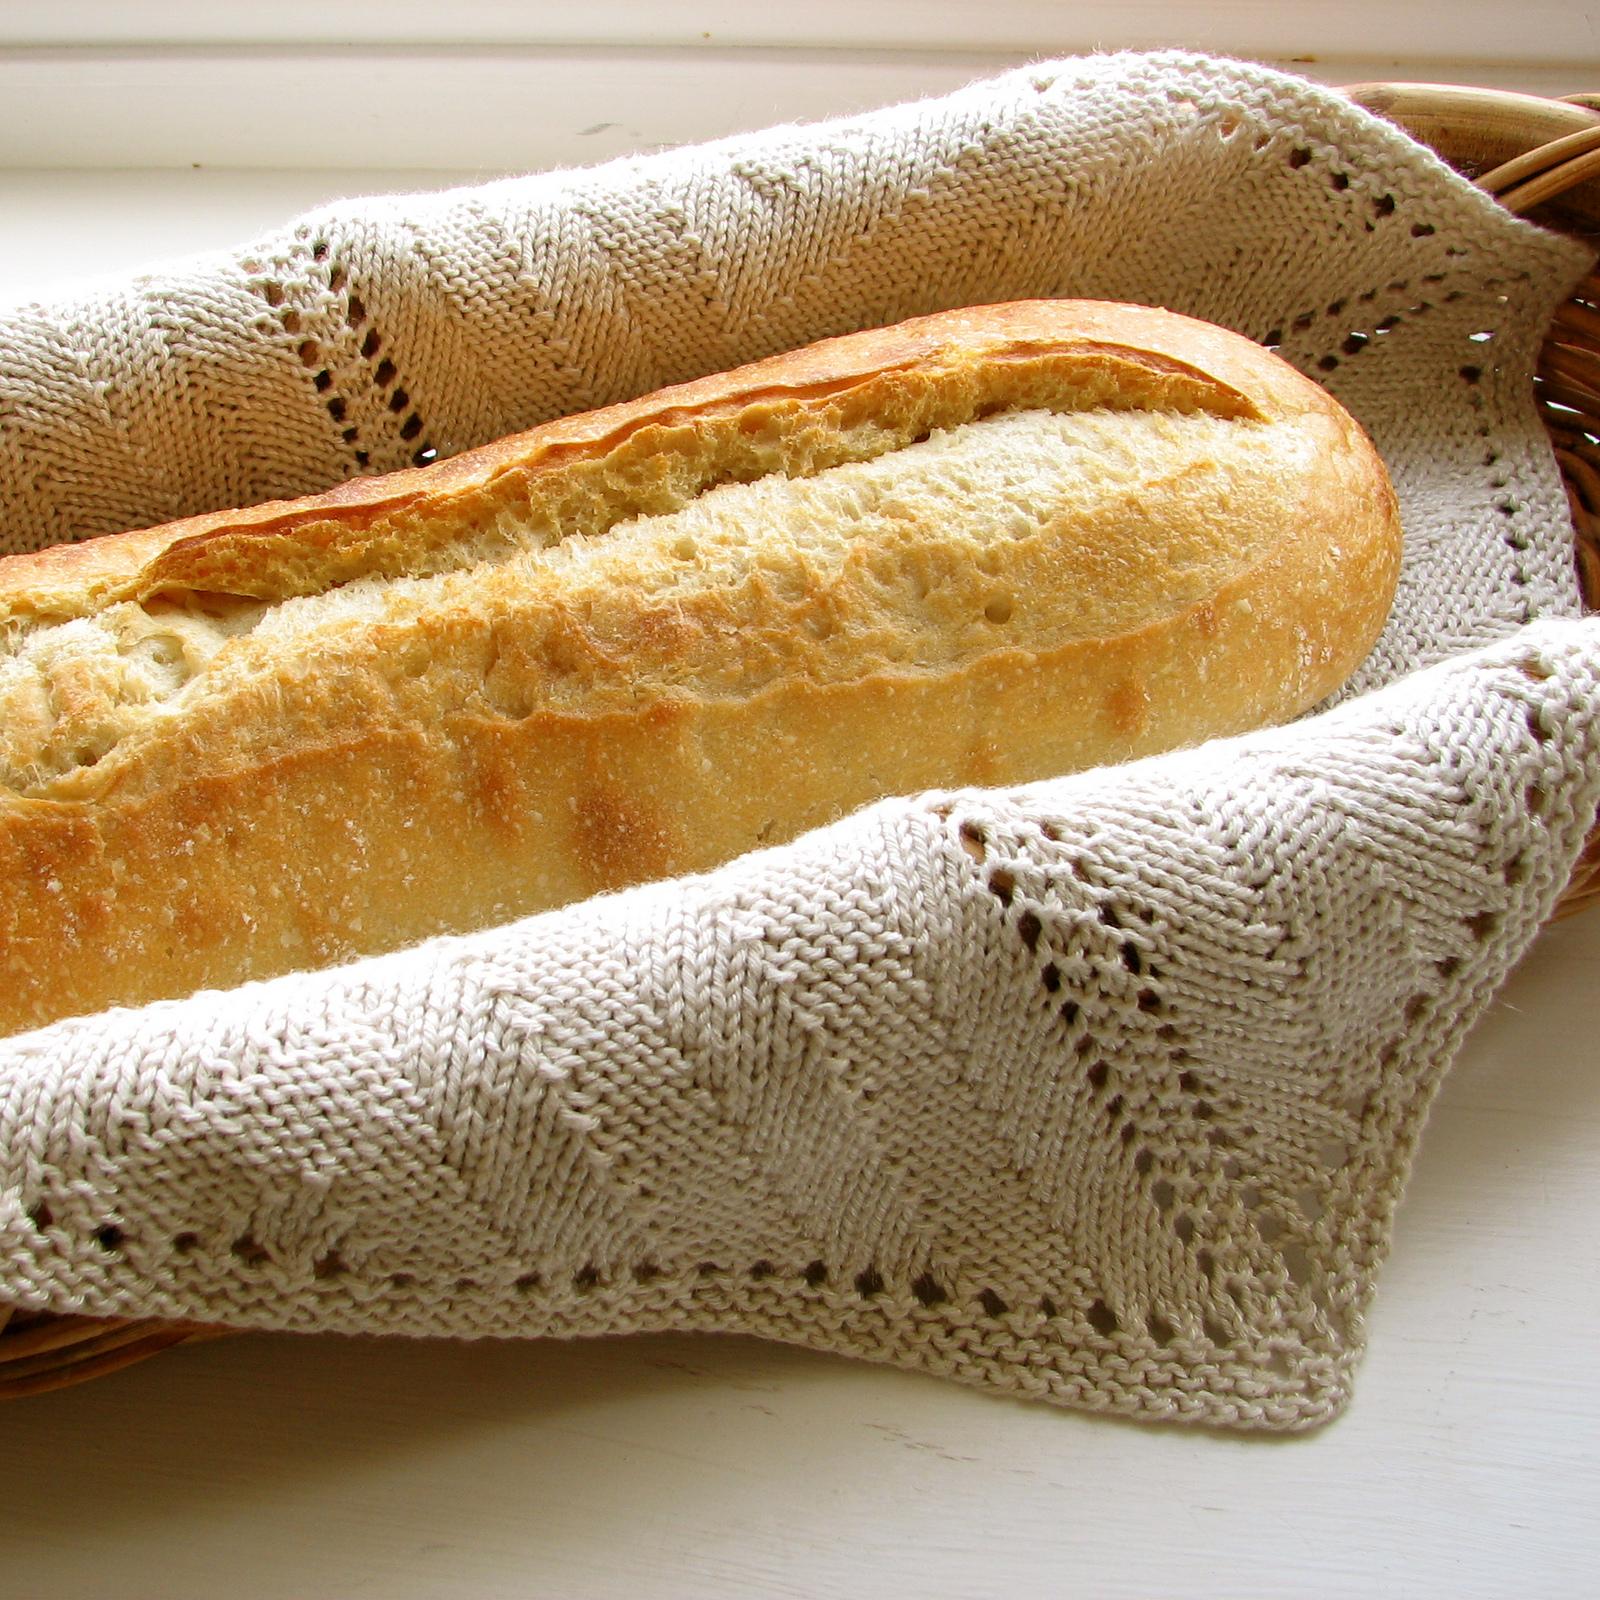 Classic Bread Basket Liner.JPG